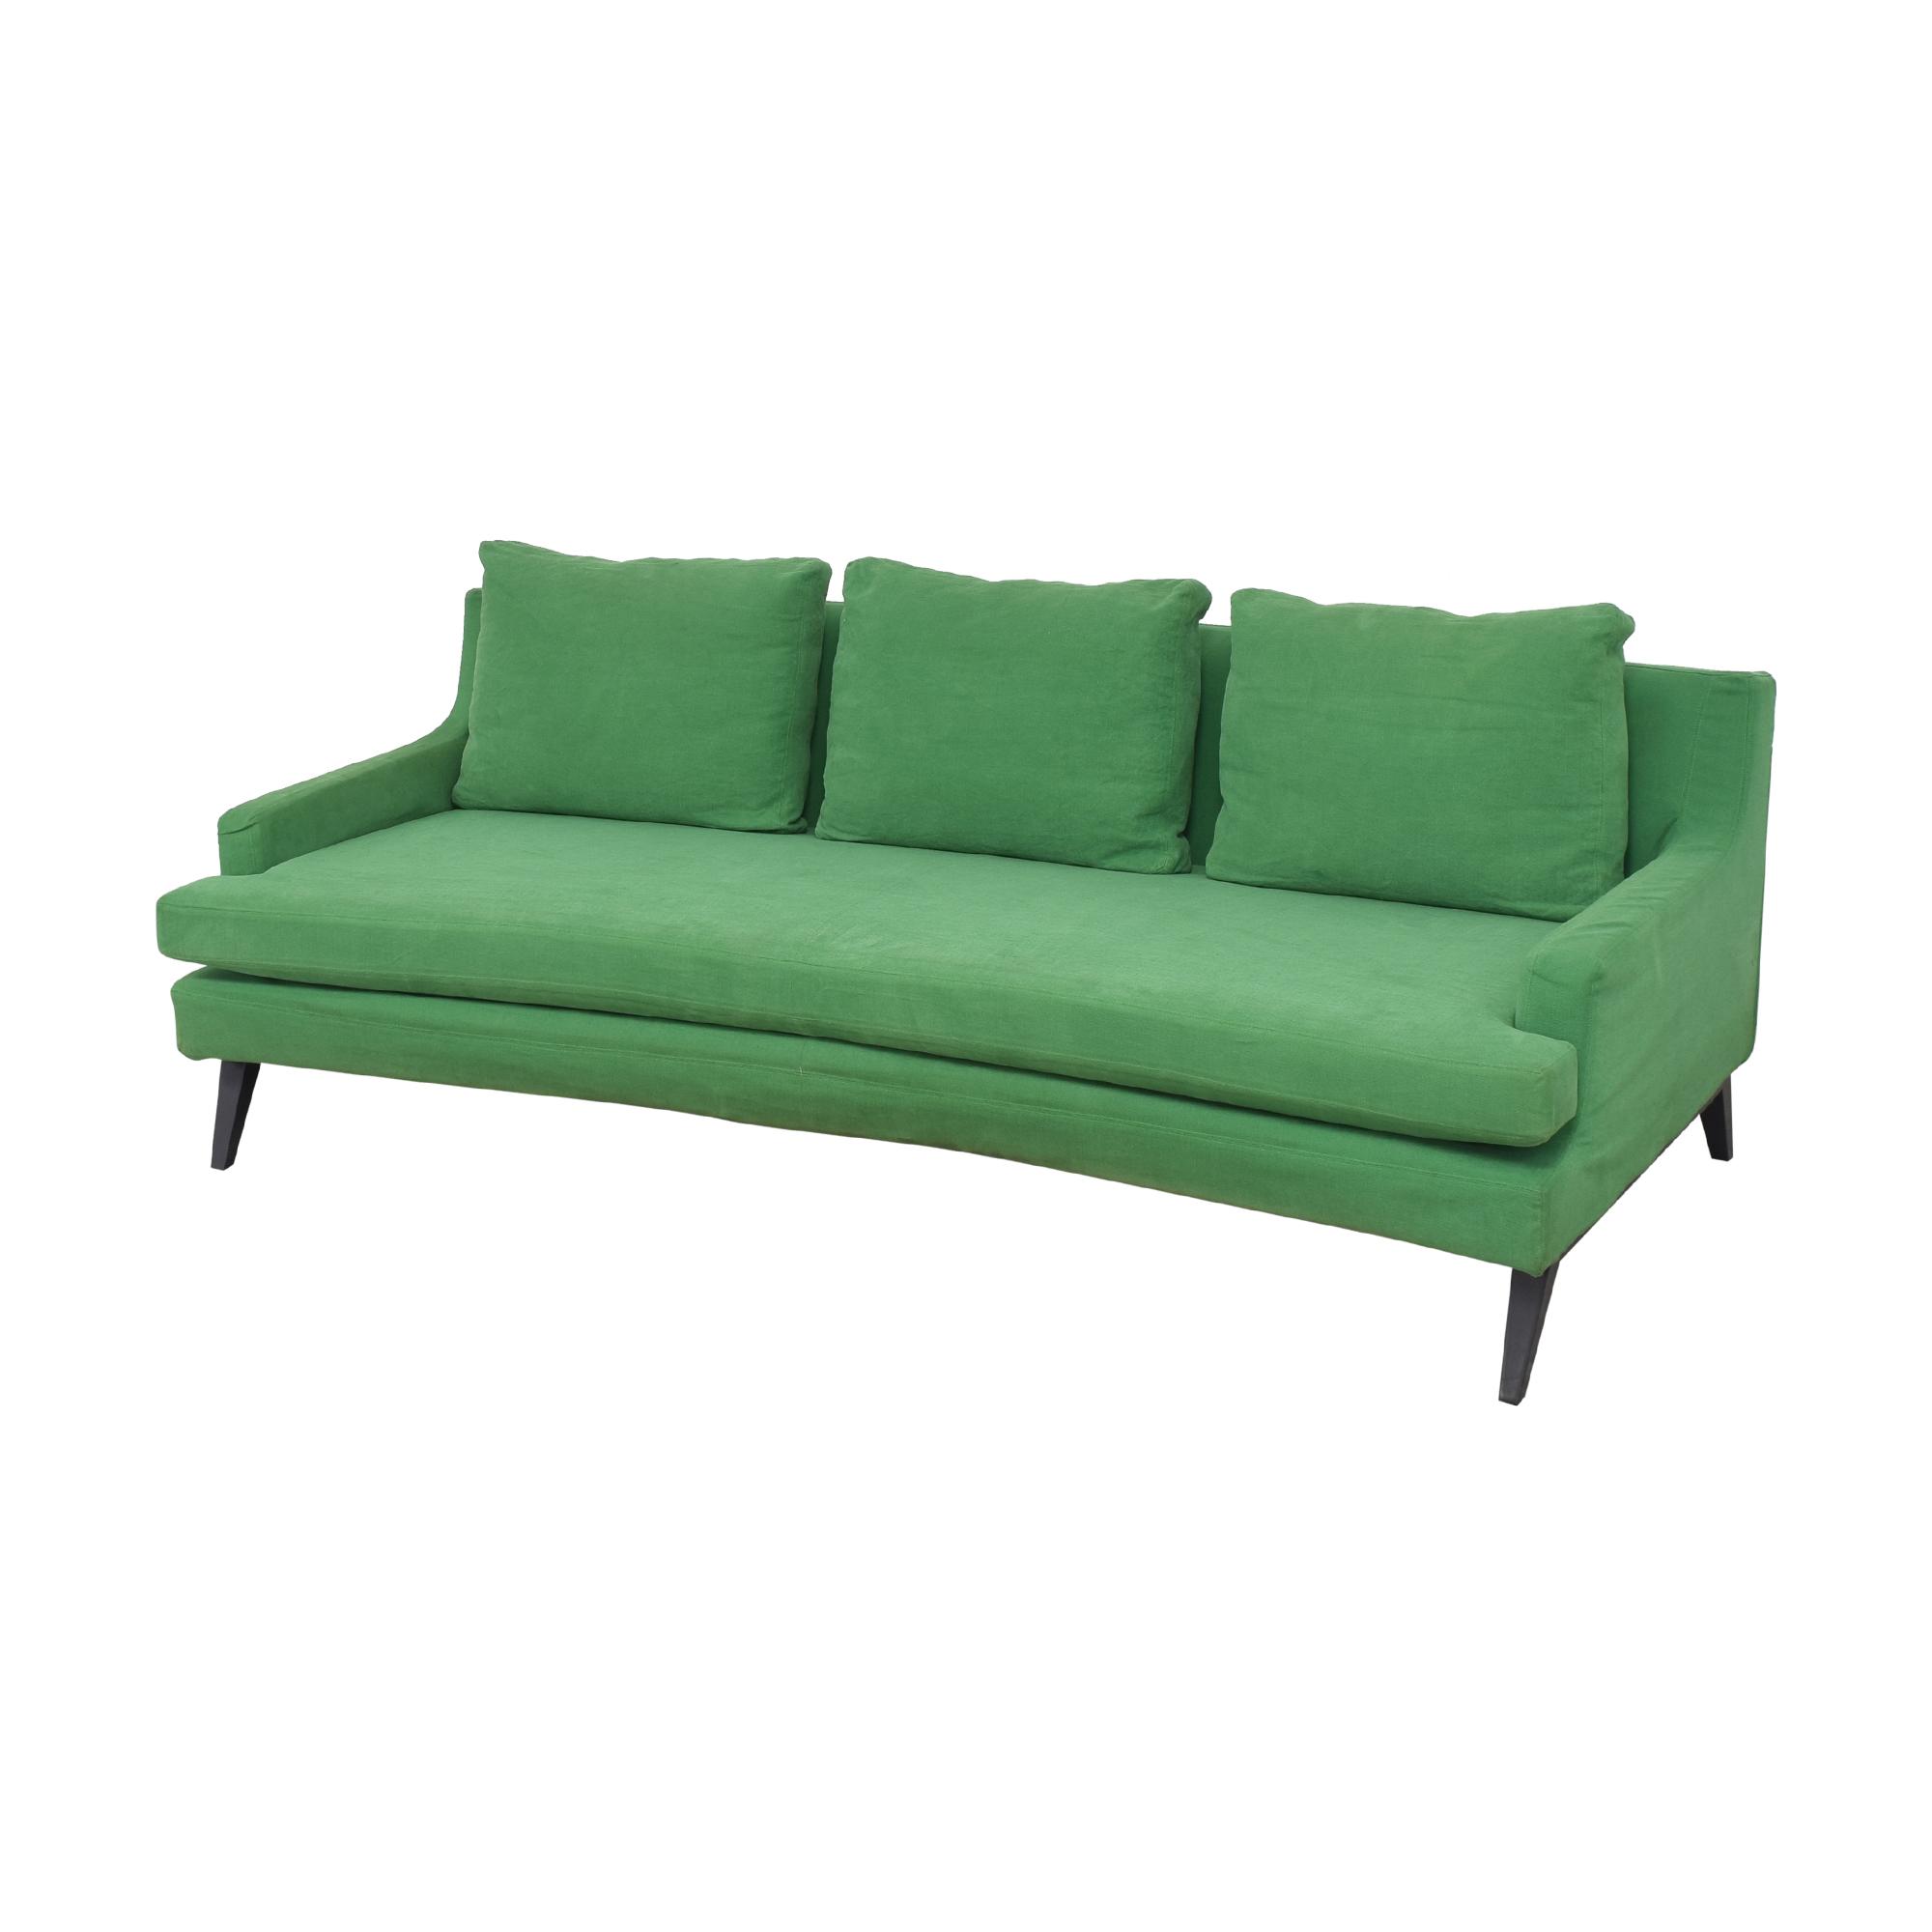 Ligne Roset Ligne Roset Belem Bench Cushion Sofa discount